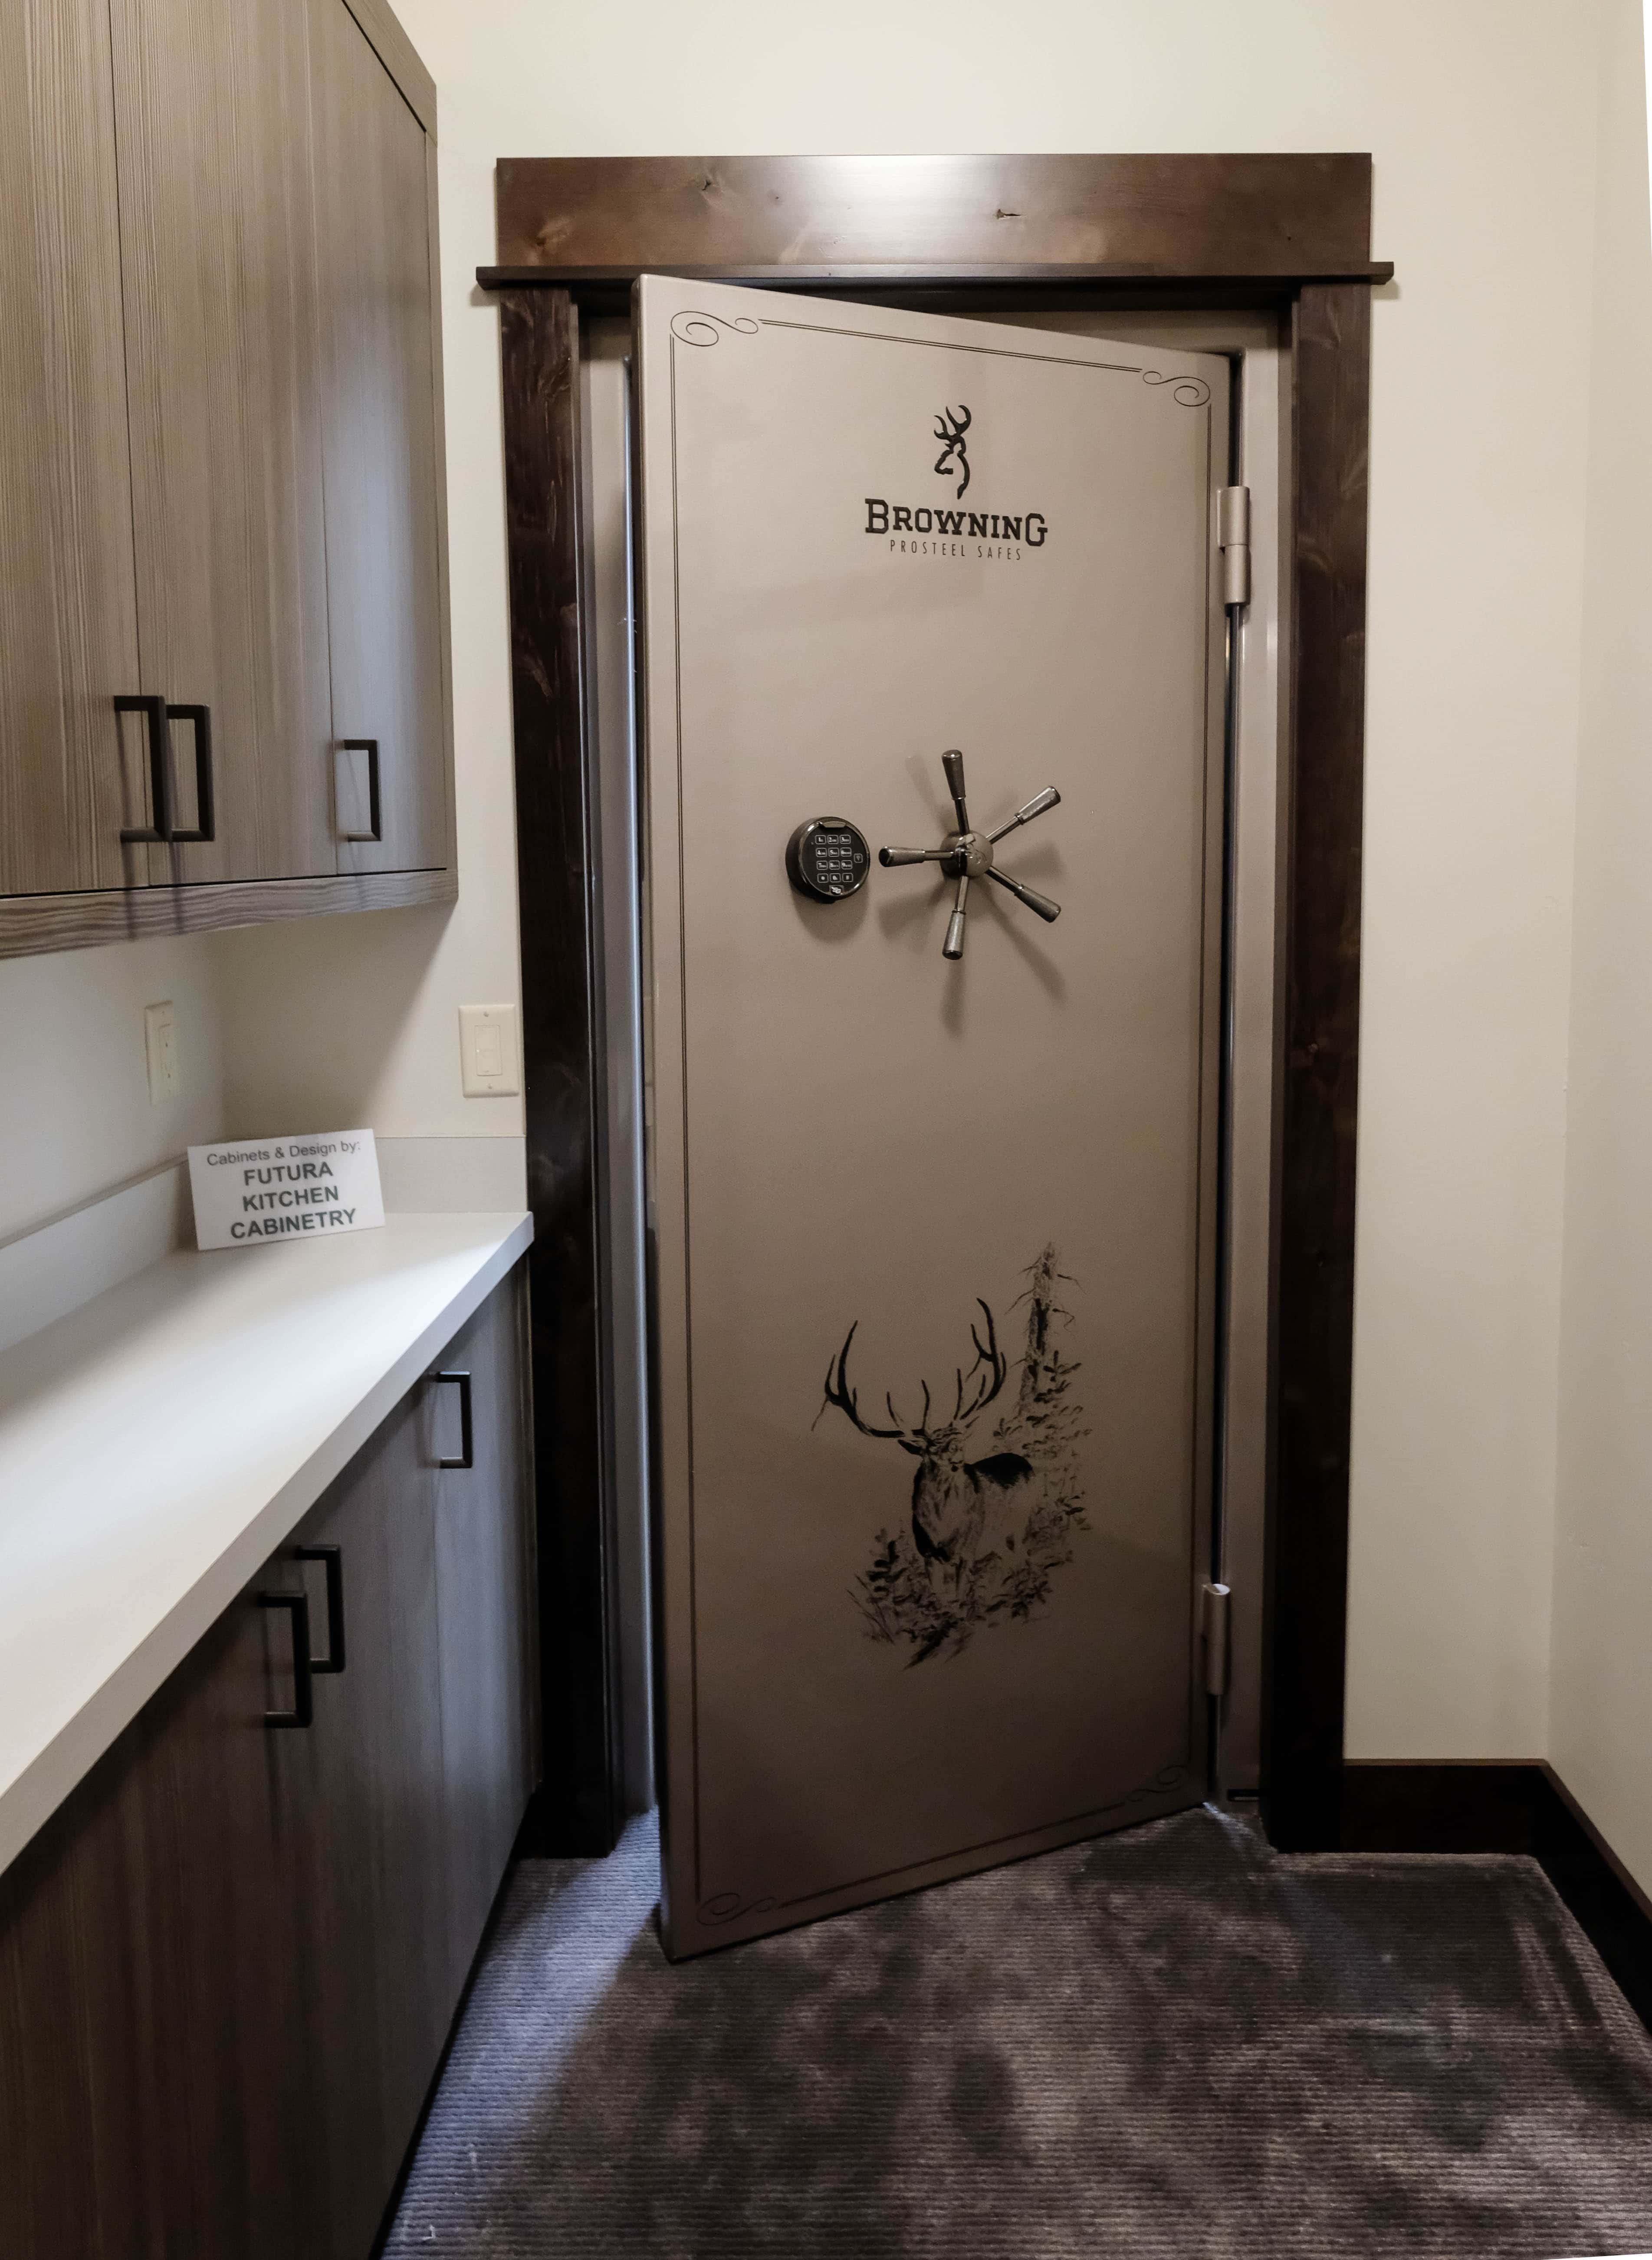 Mancave Ideas: Built-in Safe